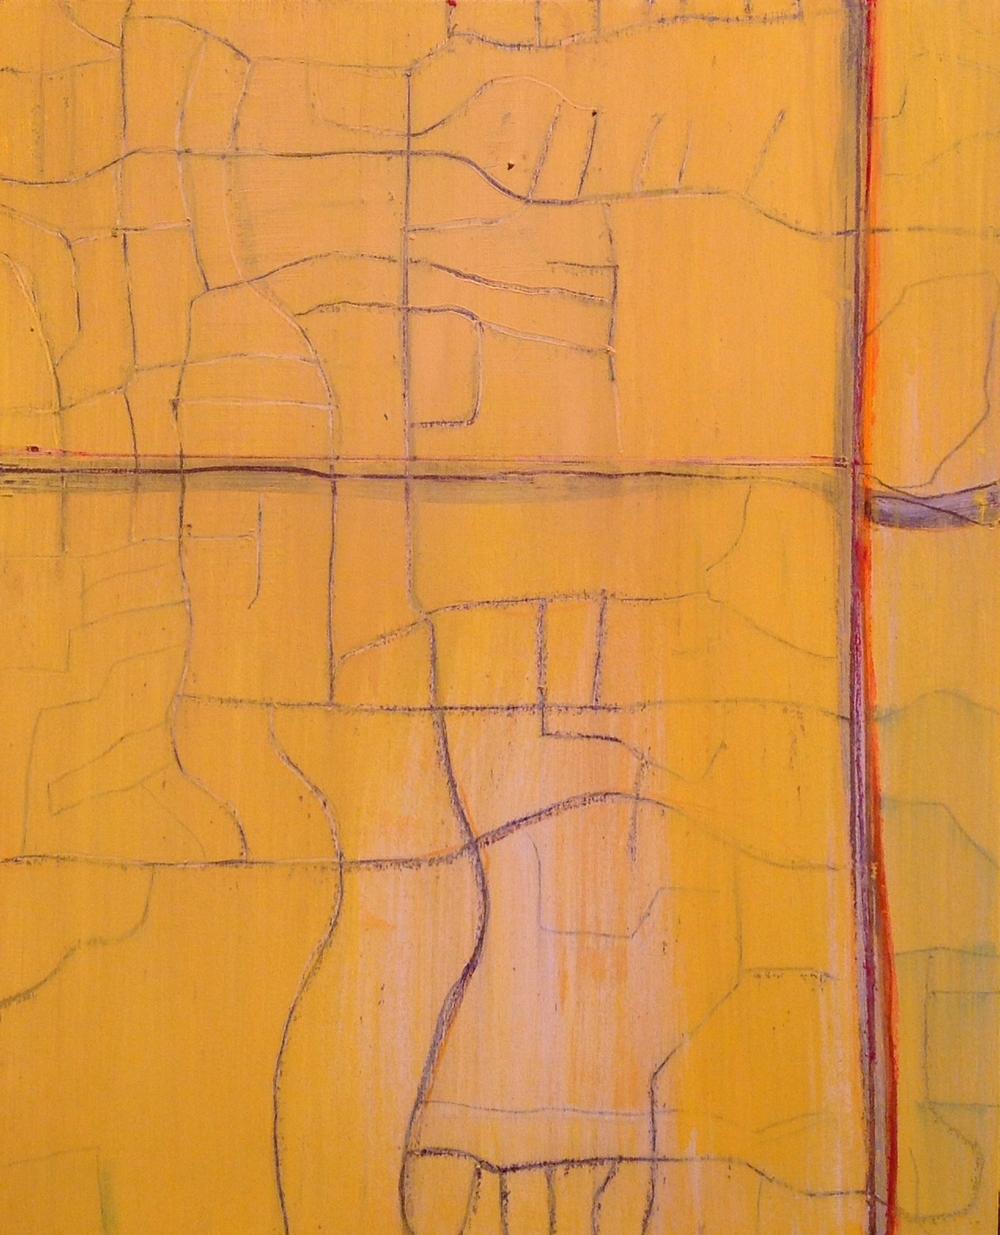 Artmap Section #25